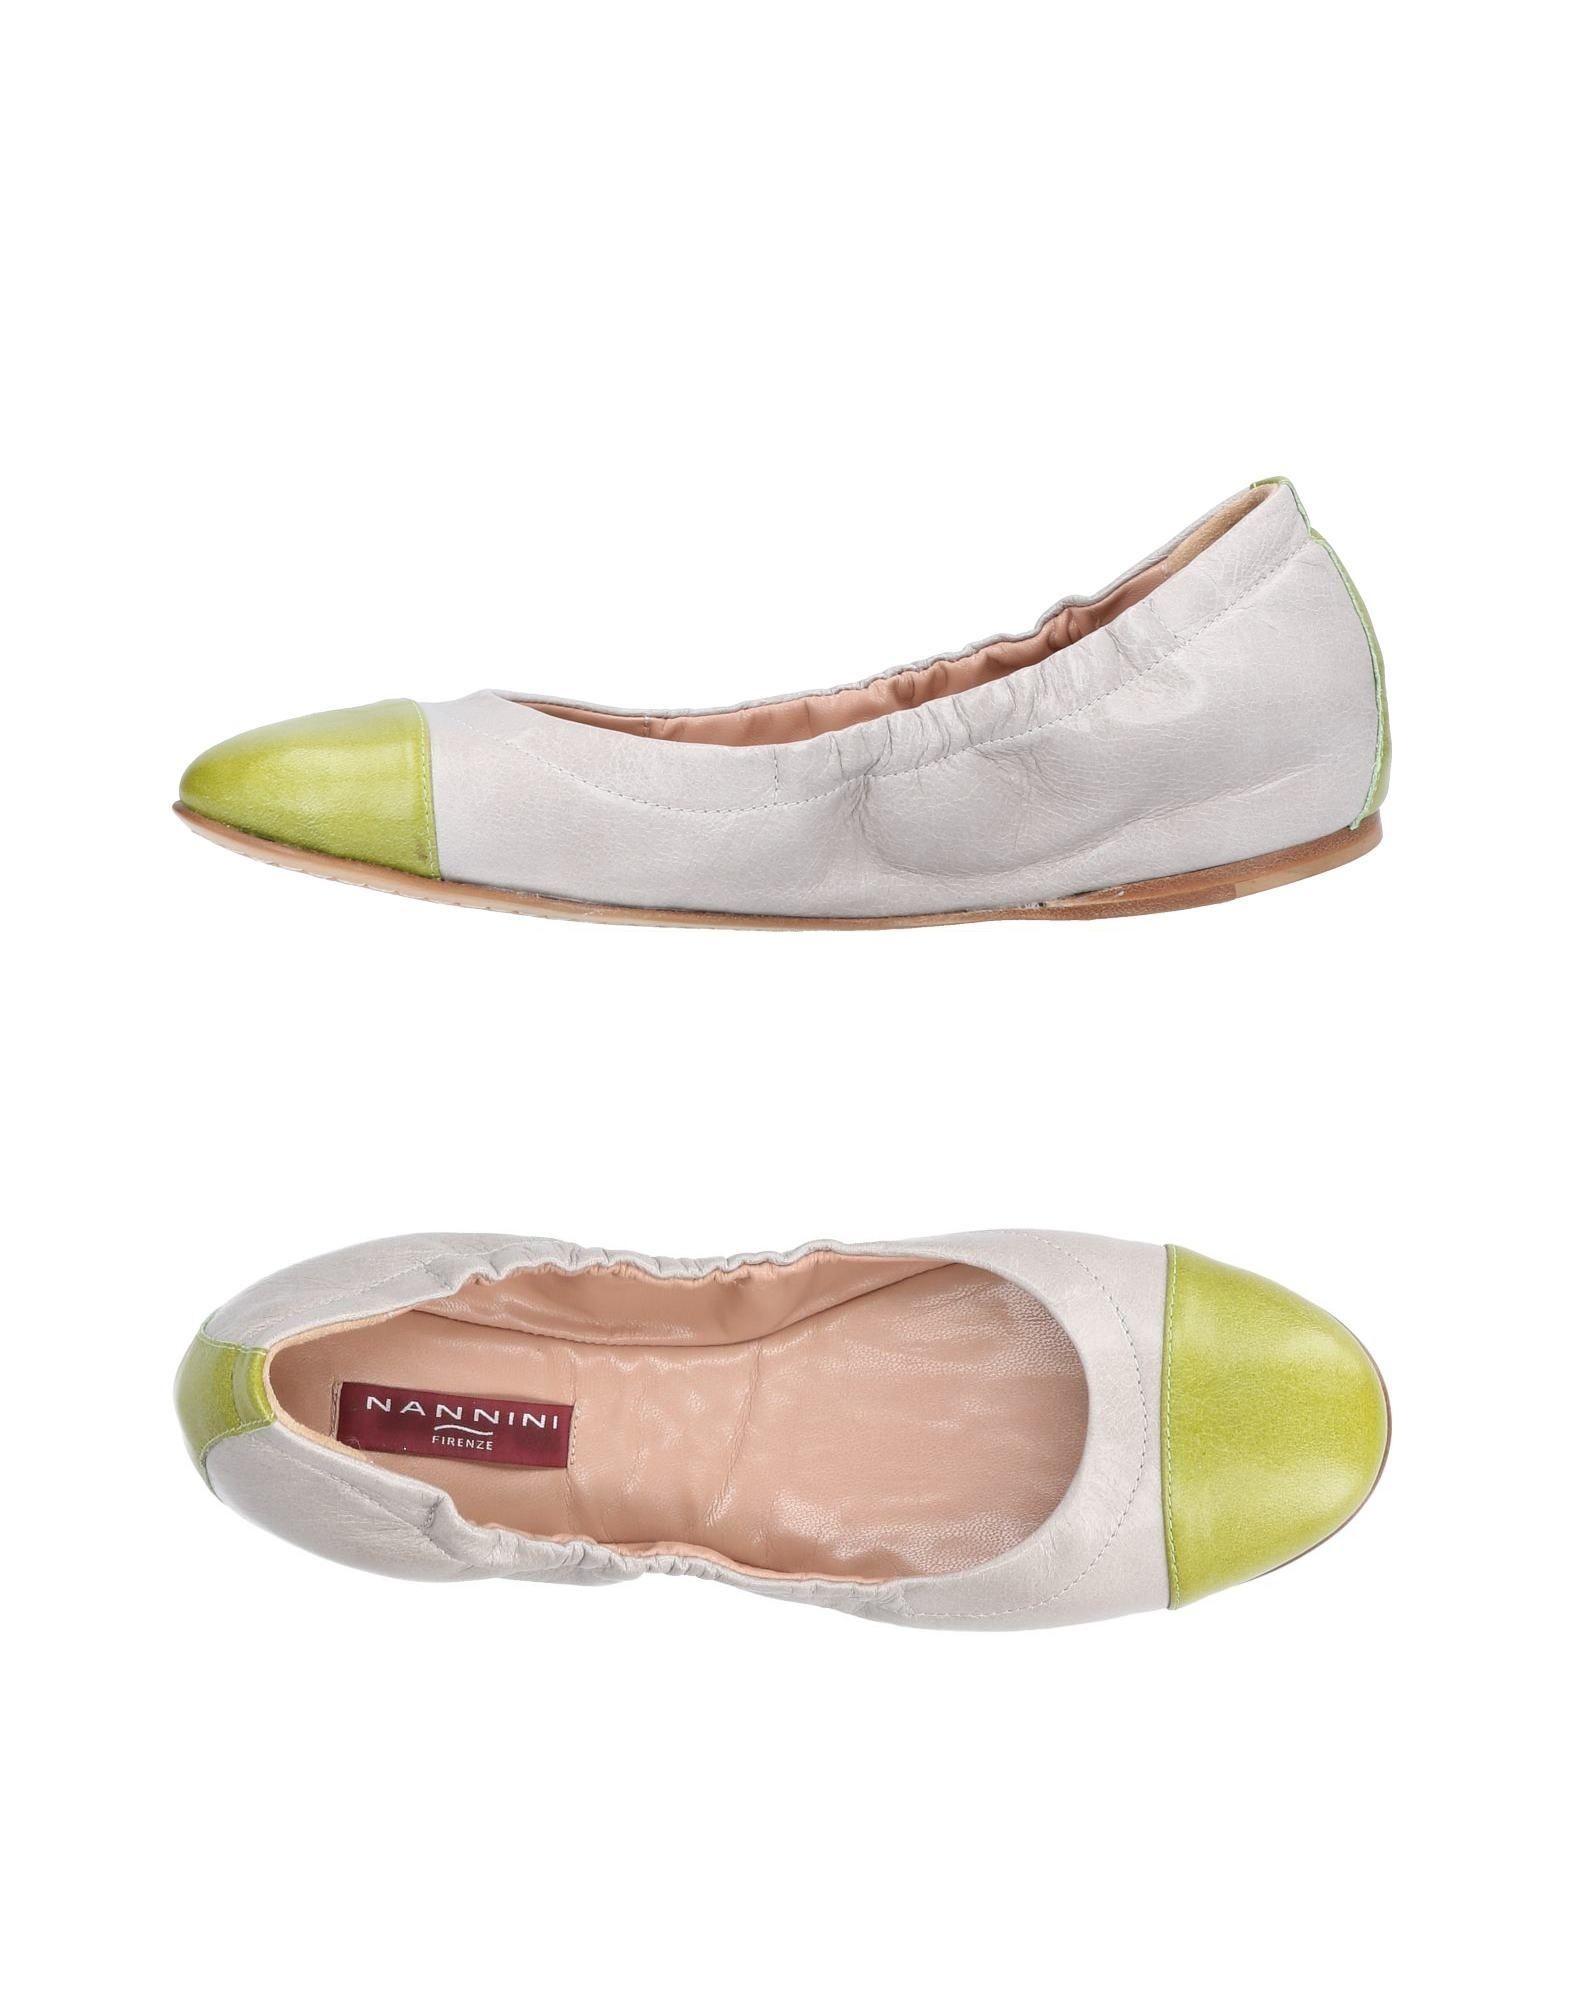 Nannini Ballerinas Damen  beliebte 11460138KK Gute Qualität beliebte  Schuhe f929df